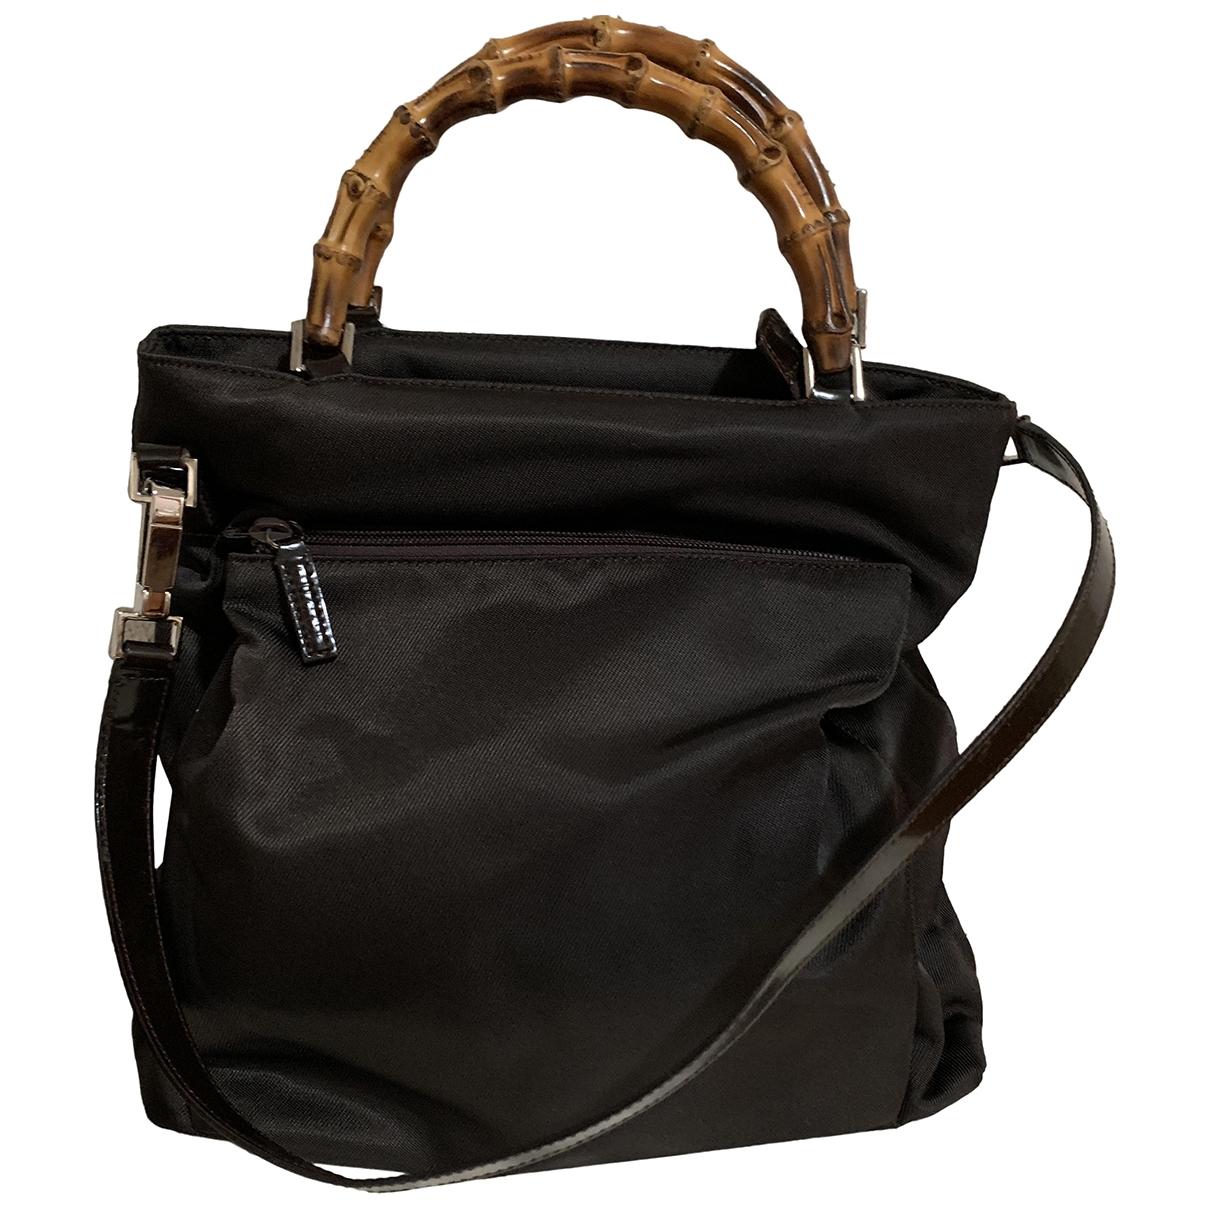 Gucci Bamboo Brown handbag for Women \N